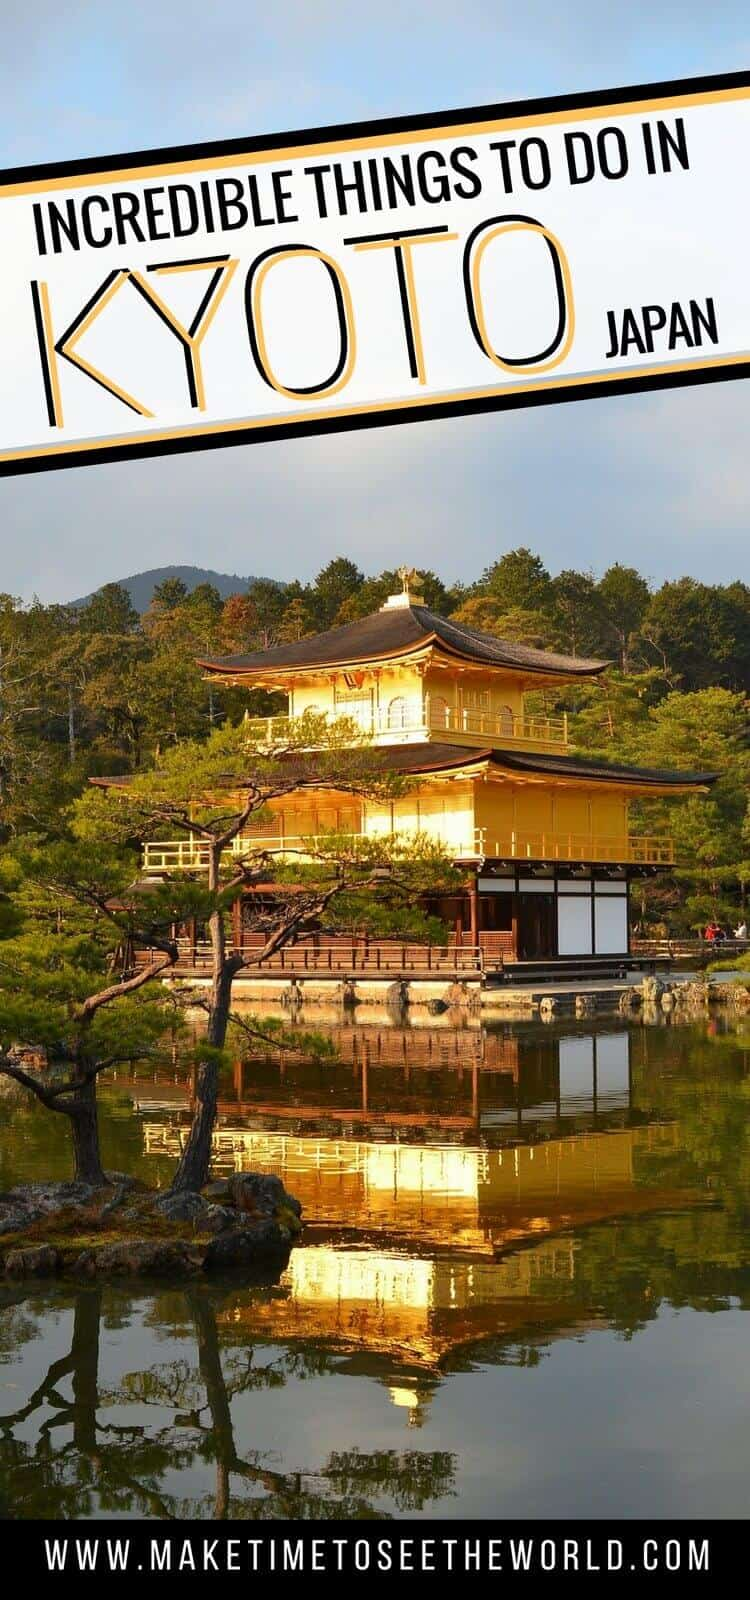 Kyoto Points of Interest